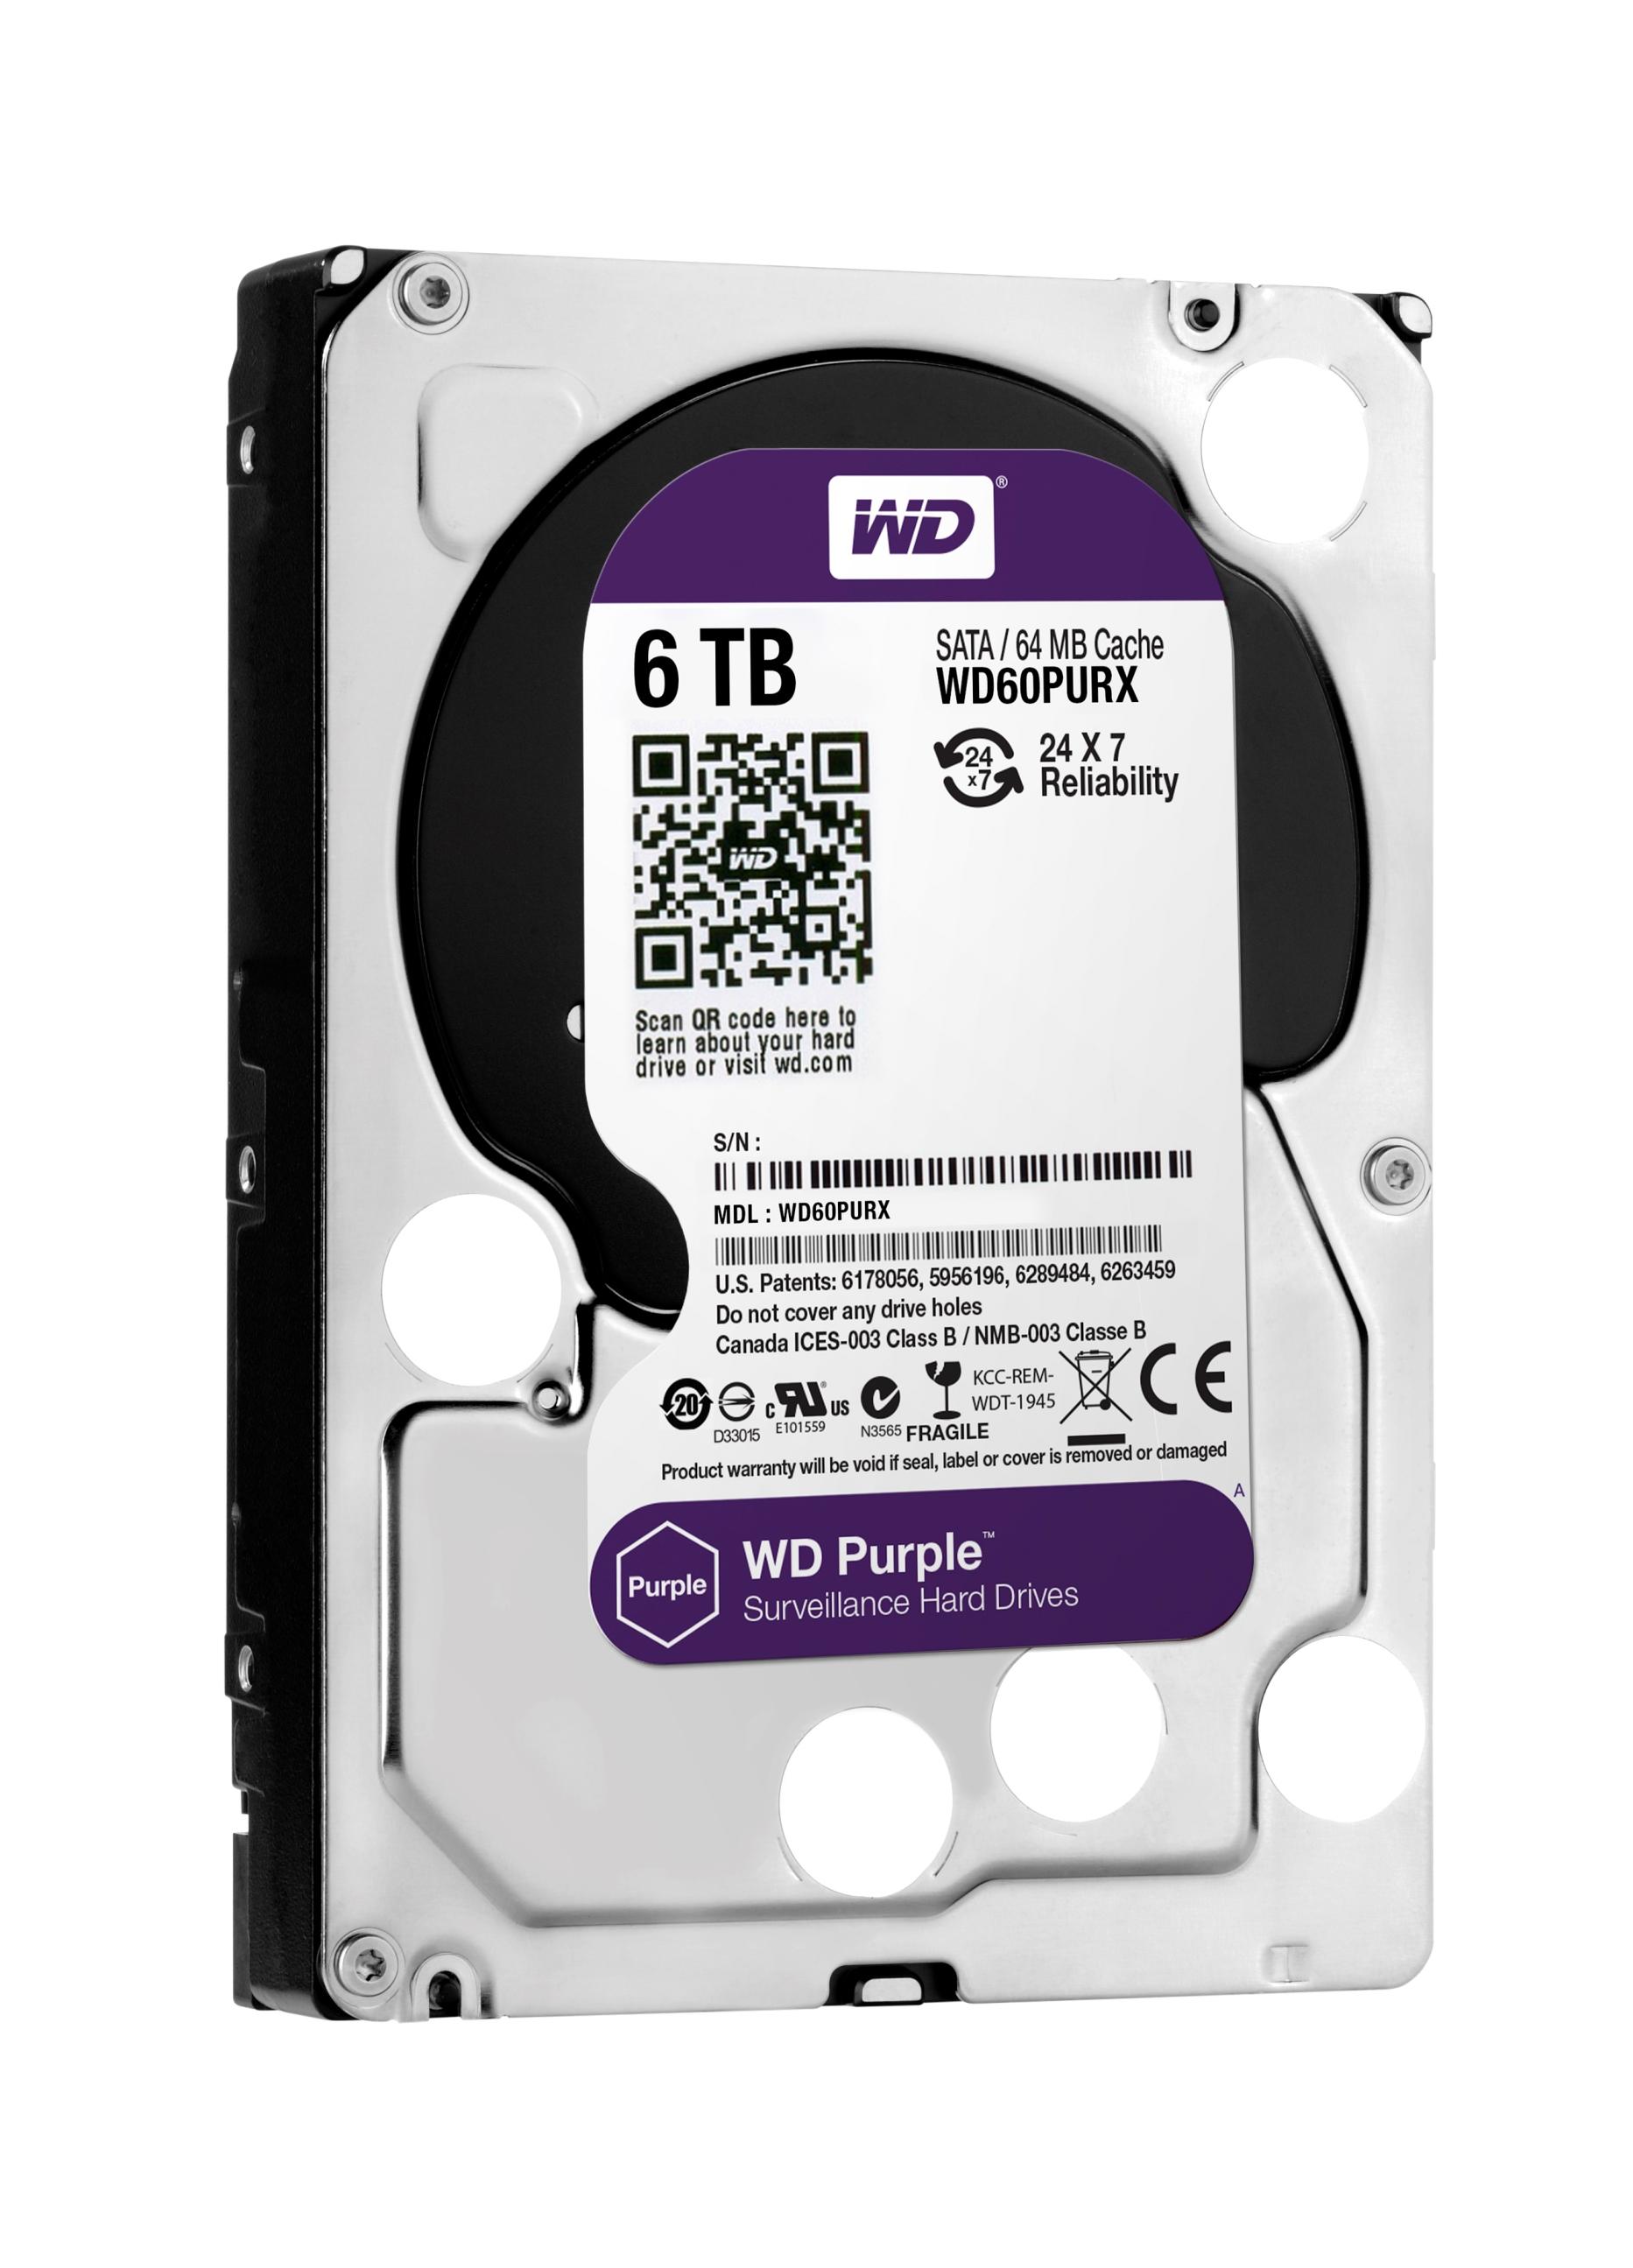 WD®擴展監控系統級硬碟系列 WD Purple™推出6 TB高容量主攻物聯網「霧端」監控環境